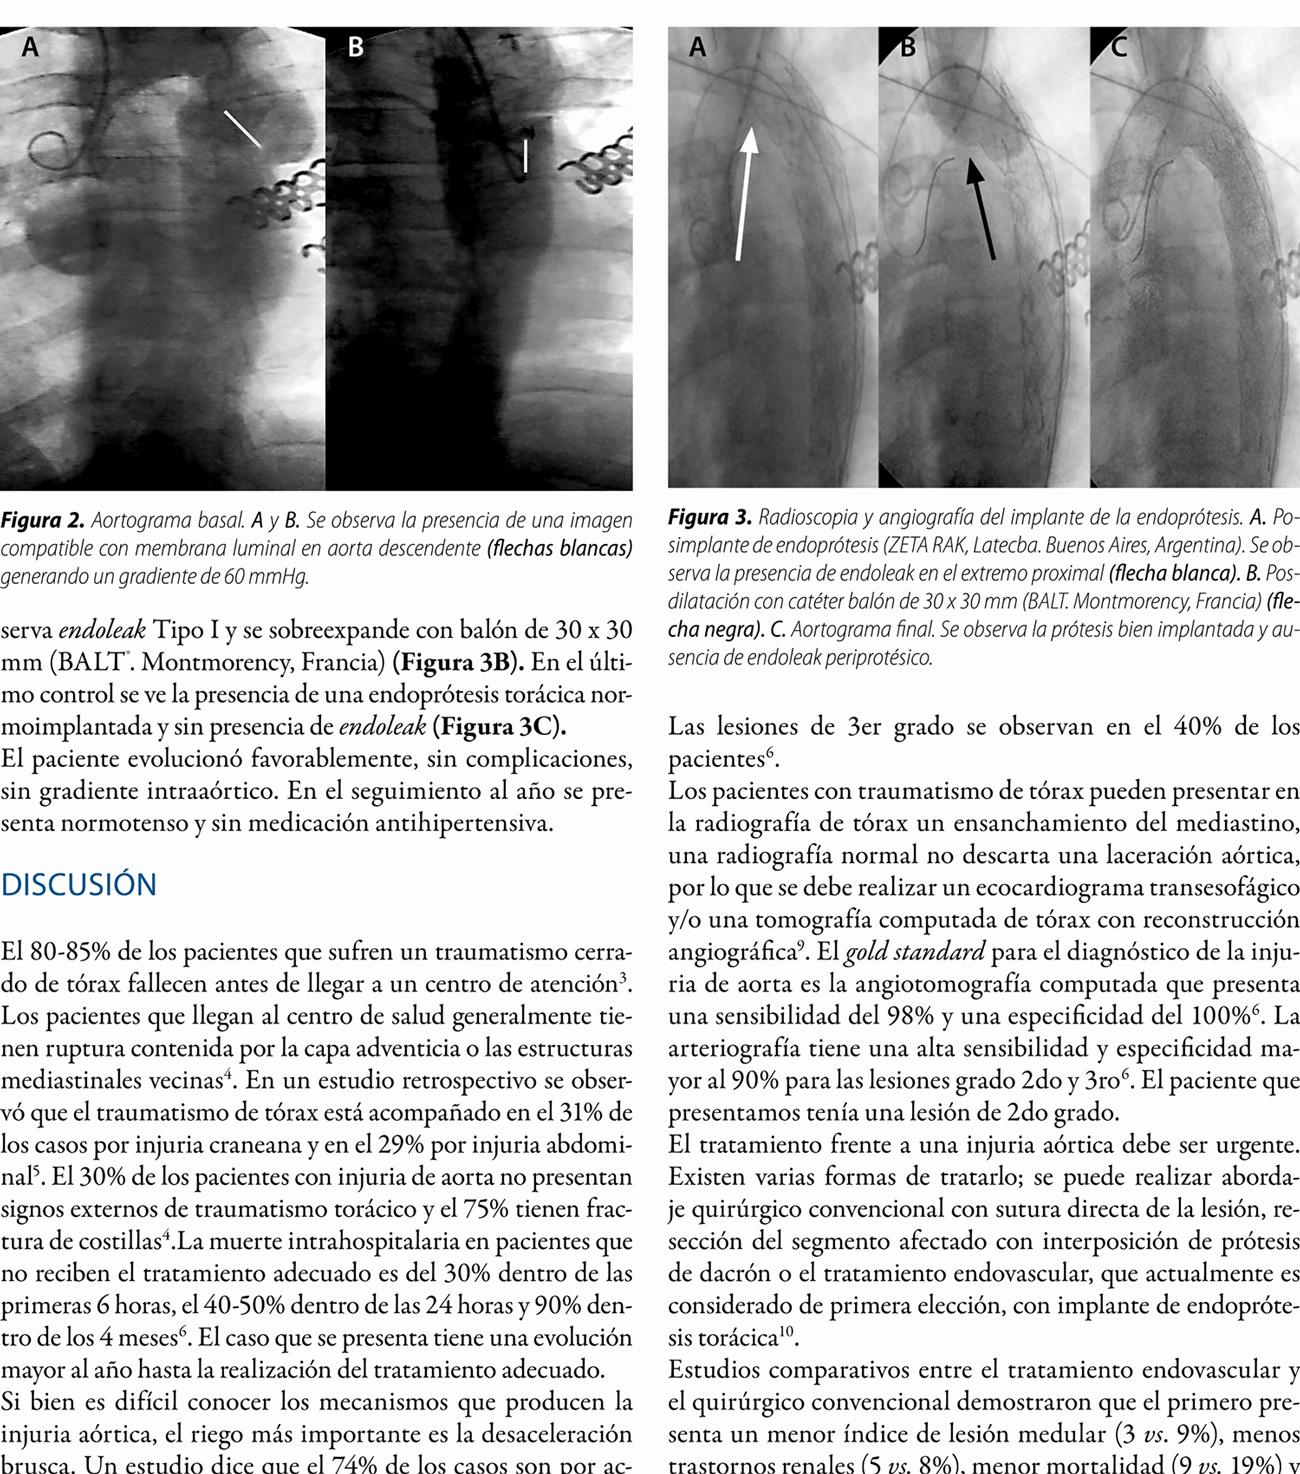 Presentación atípica de injuria aórtica por traumatismo cerrado de tórax